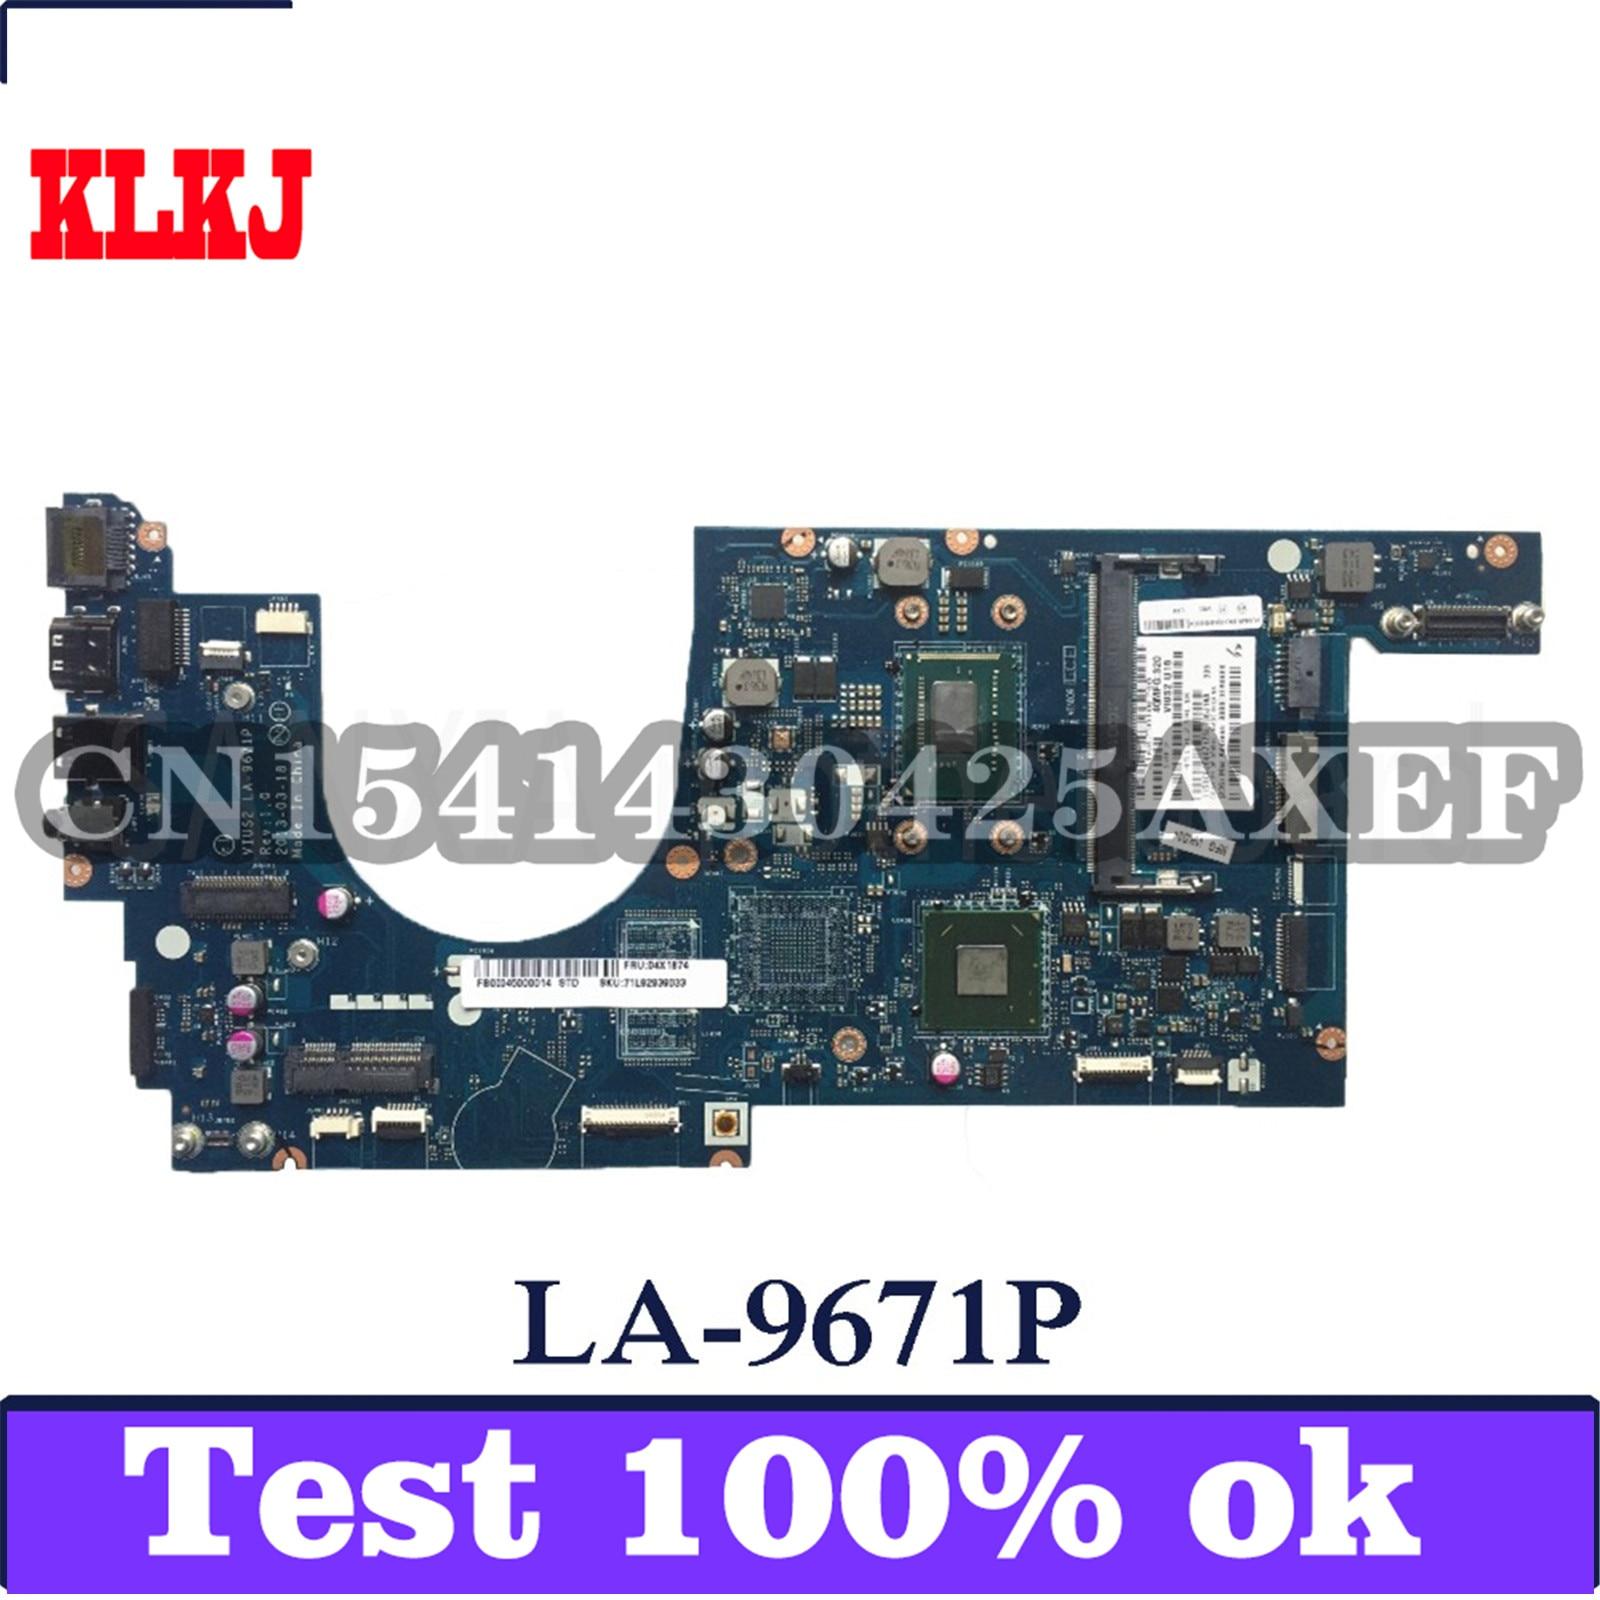 KLKJ LA-9671P اللوحة الأم لأجهزة الكمبيوتر المحمول لينوفو ثينك باد S5-S531 اختبار اللوحة الرئيسية الأصلية I5-CPU